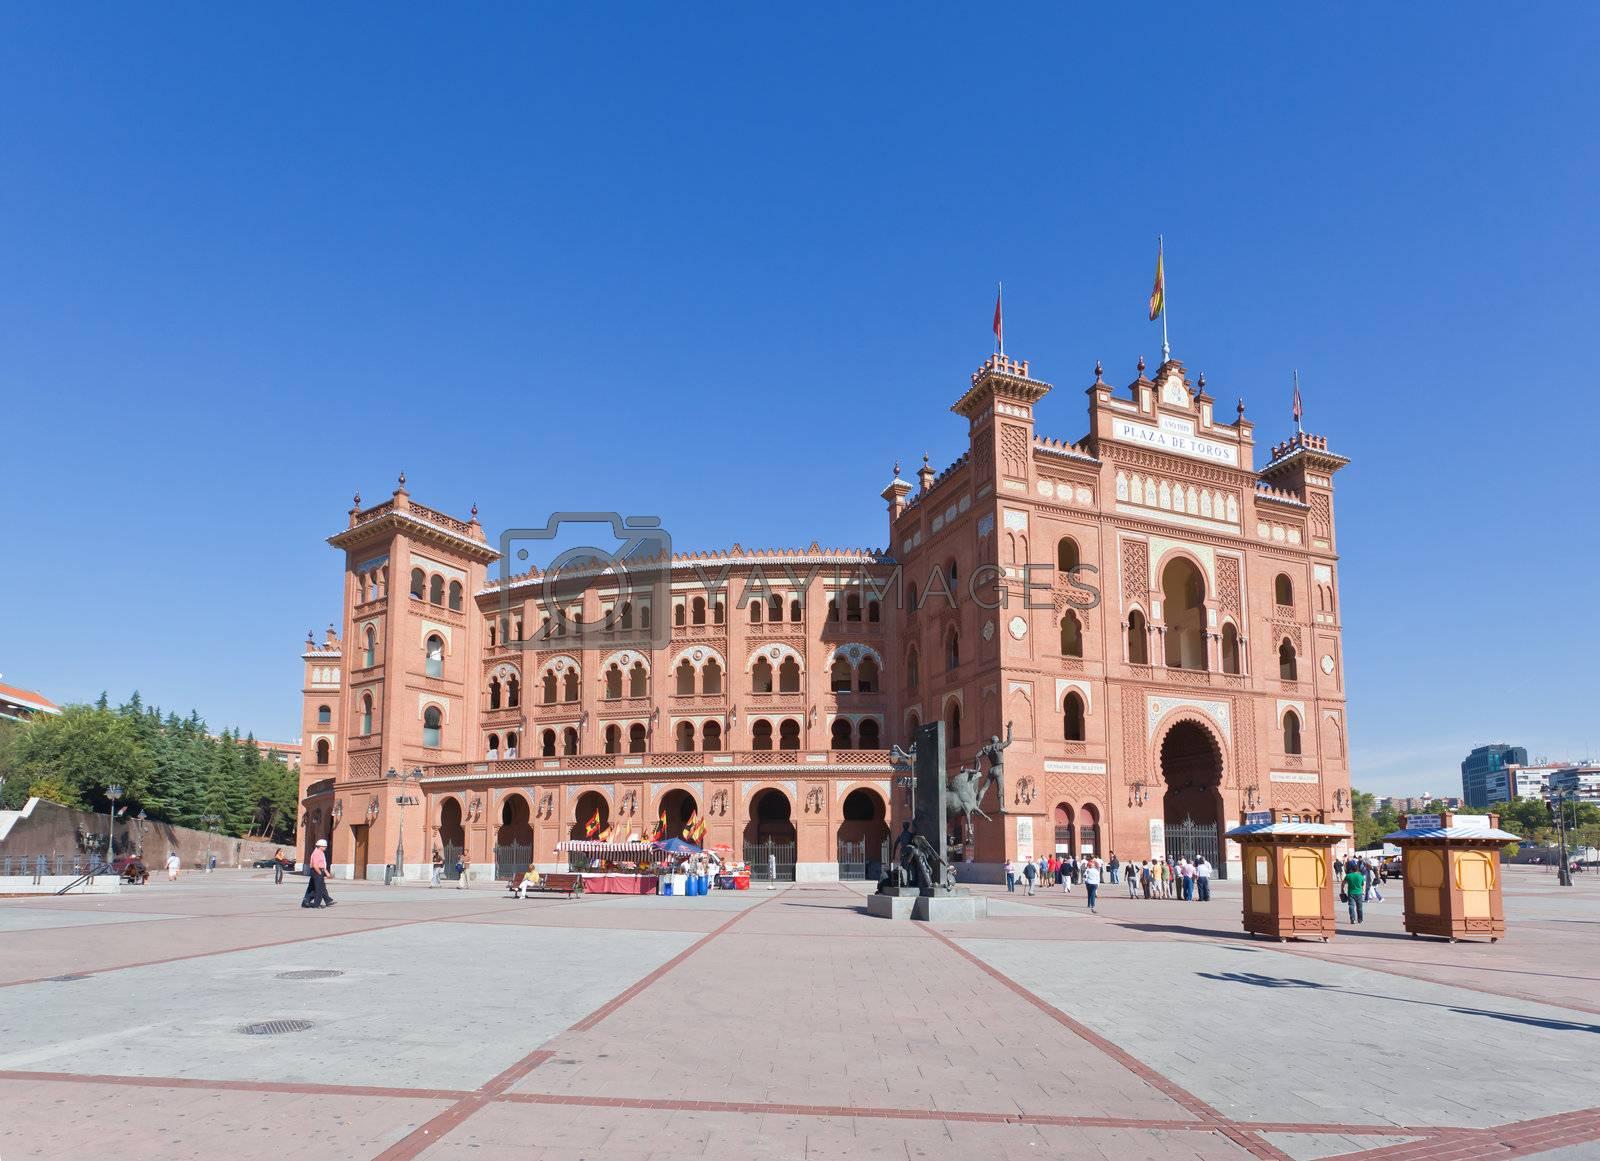 Famous bullfighting arena - Plaza de Toros in Madrid. Spain.